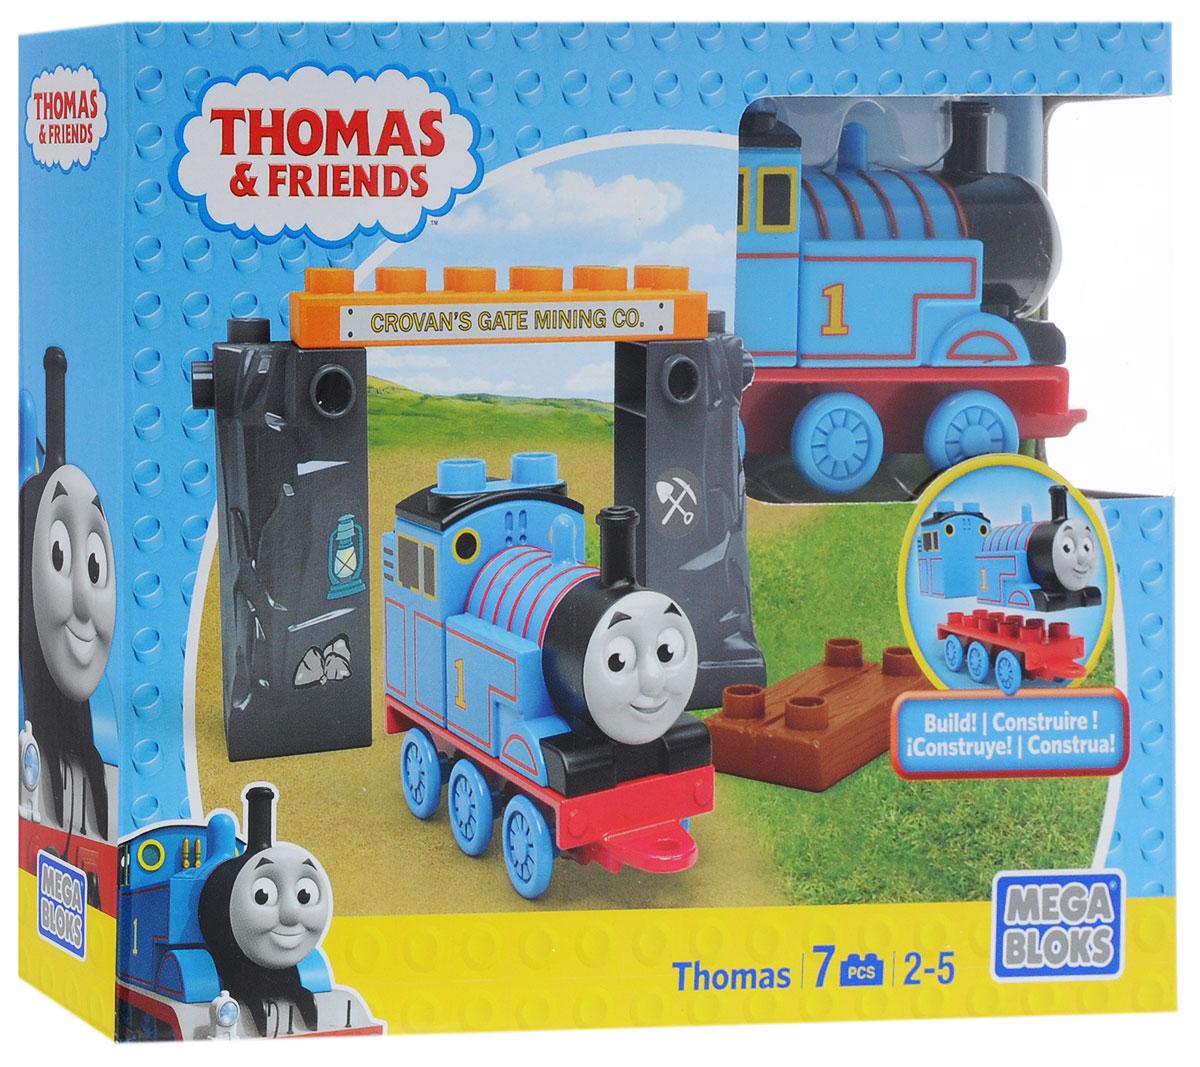 Mega Bloks Thomas & Friends Конструктор Паровозик Томас и шахта конструкторы mega bloks томас и друзья томас и гарольд